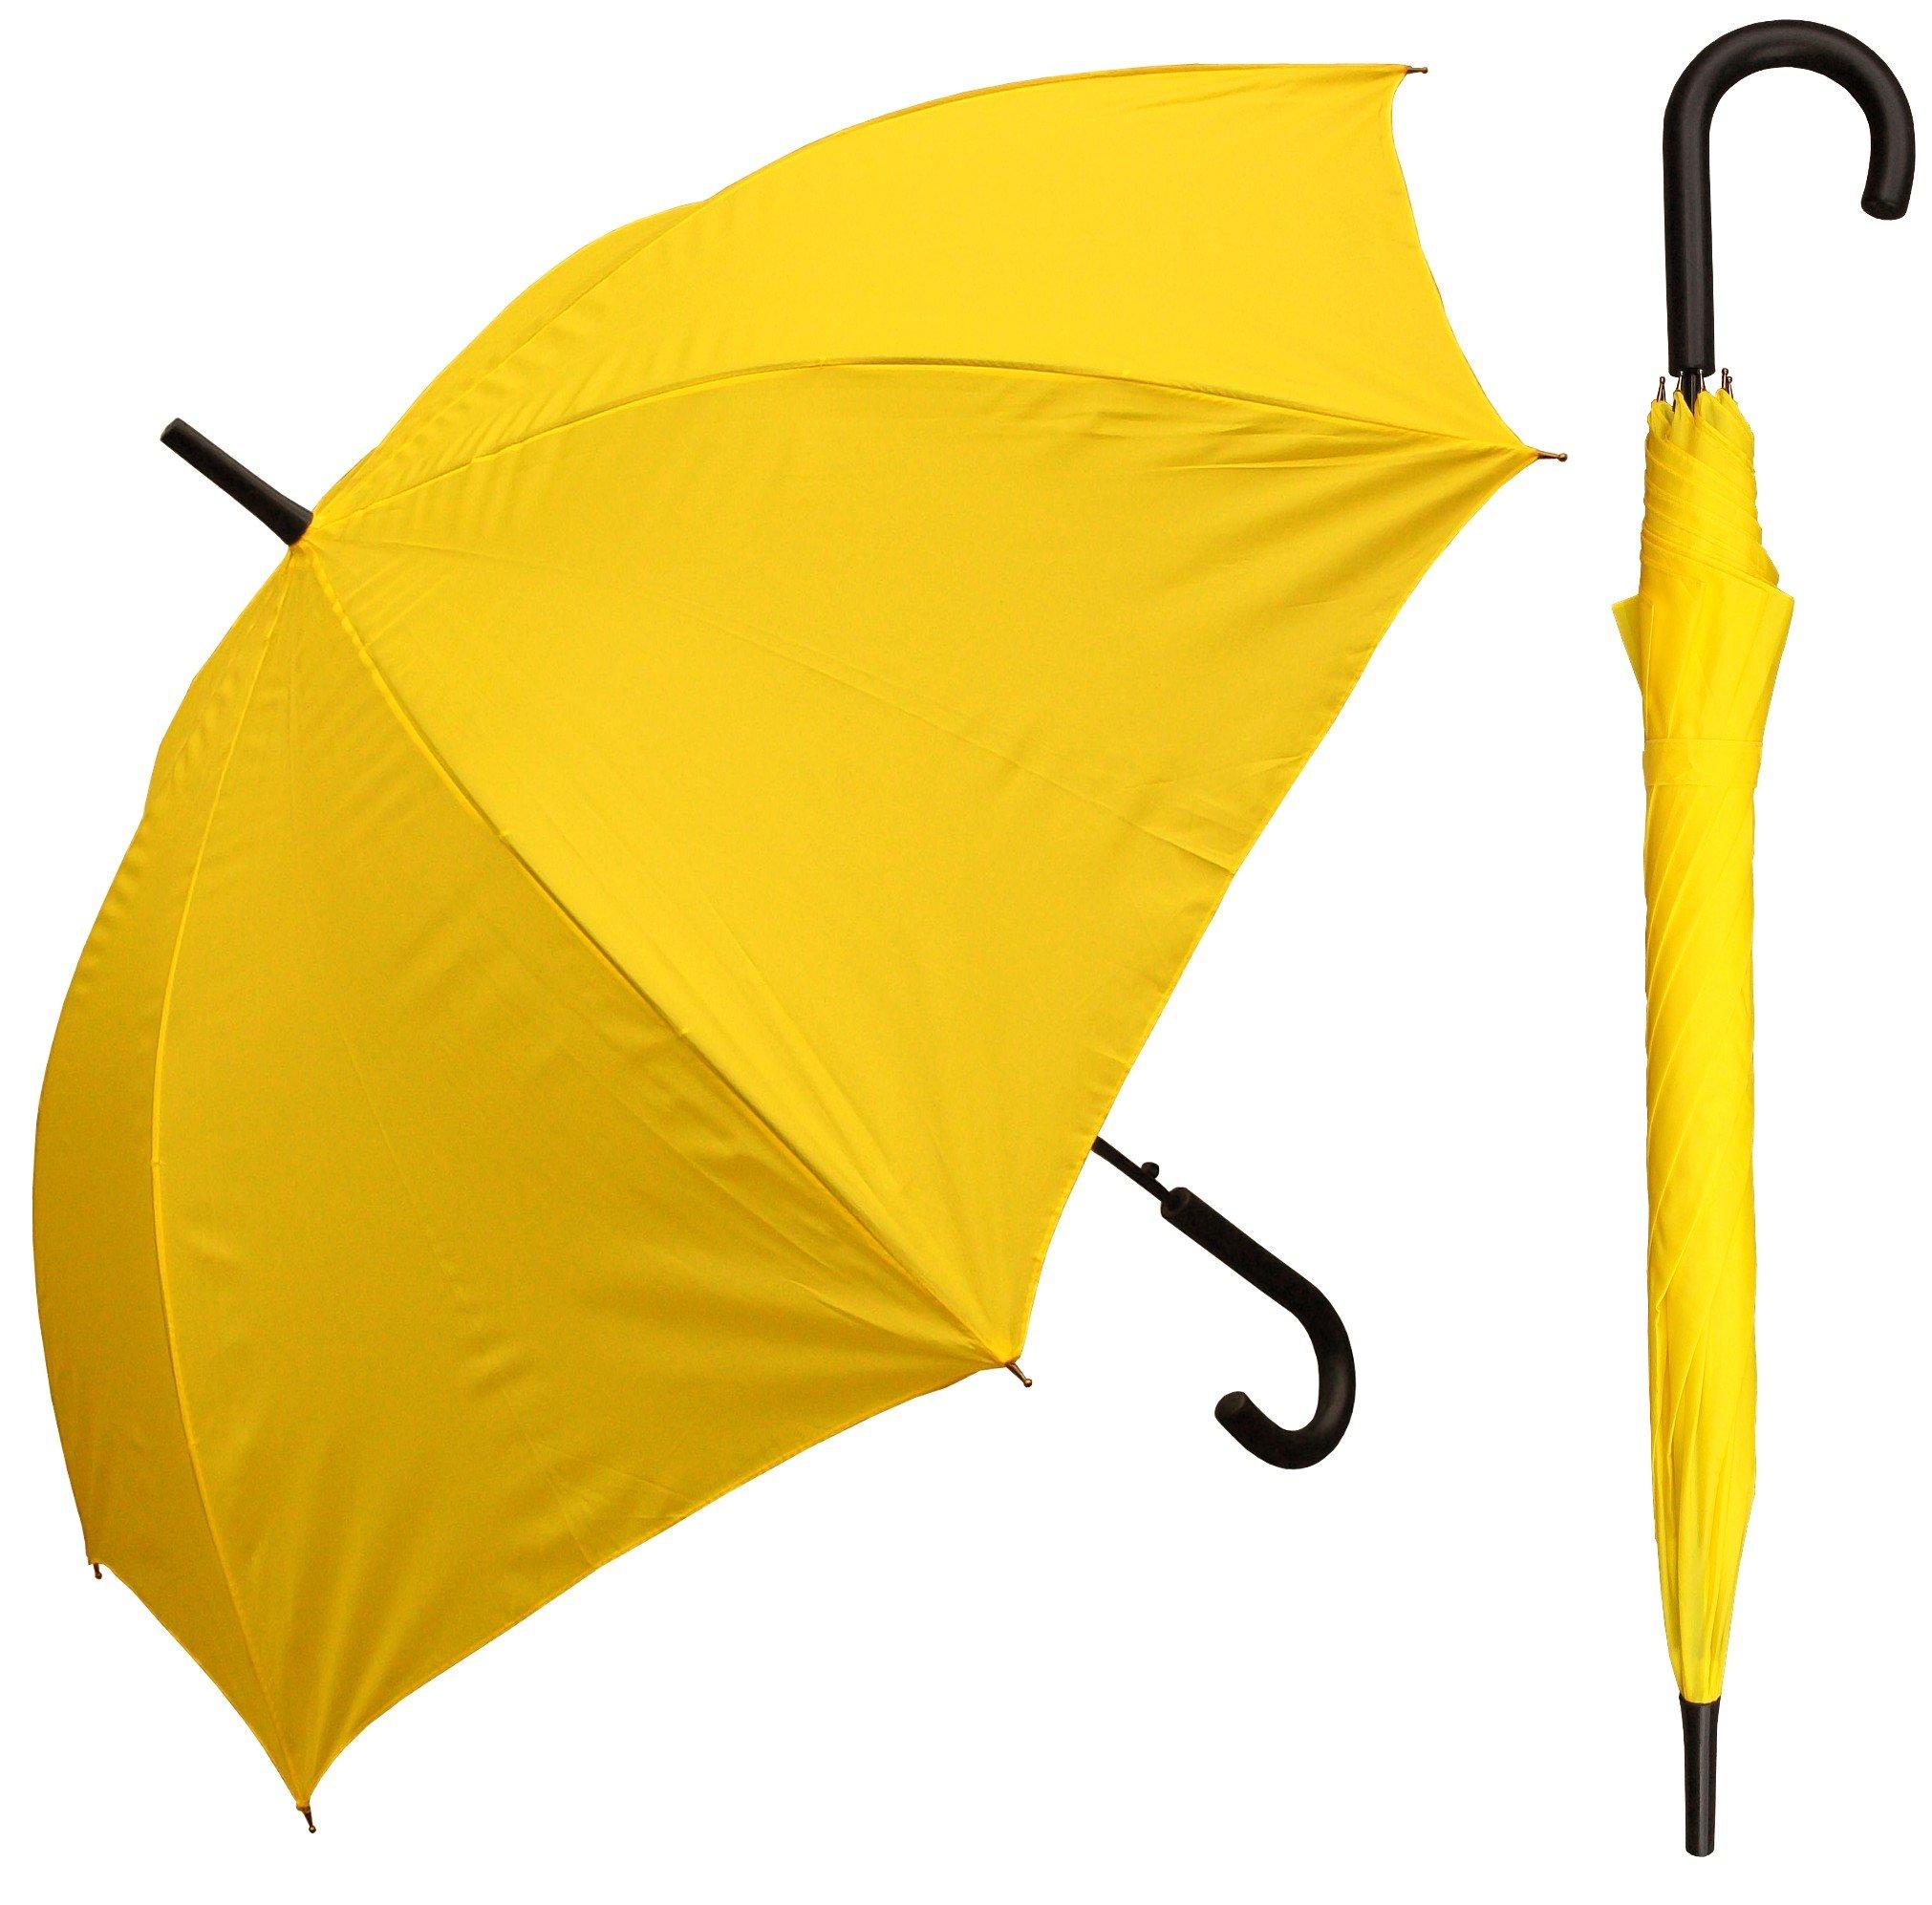 "48"" Auto Open Yellow Umbrella with Black Hook Handle"